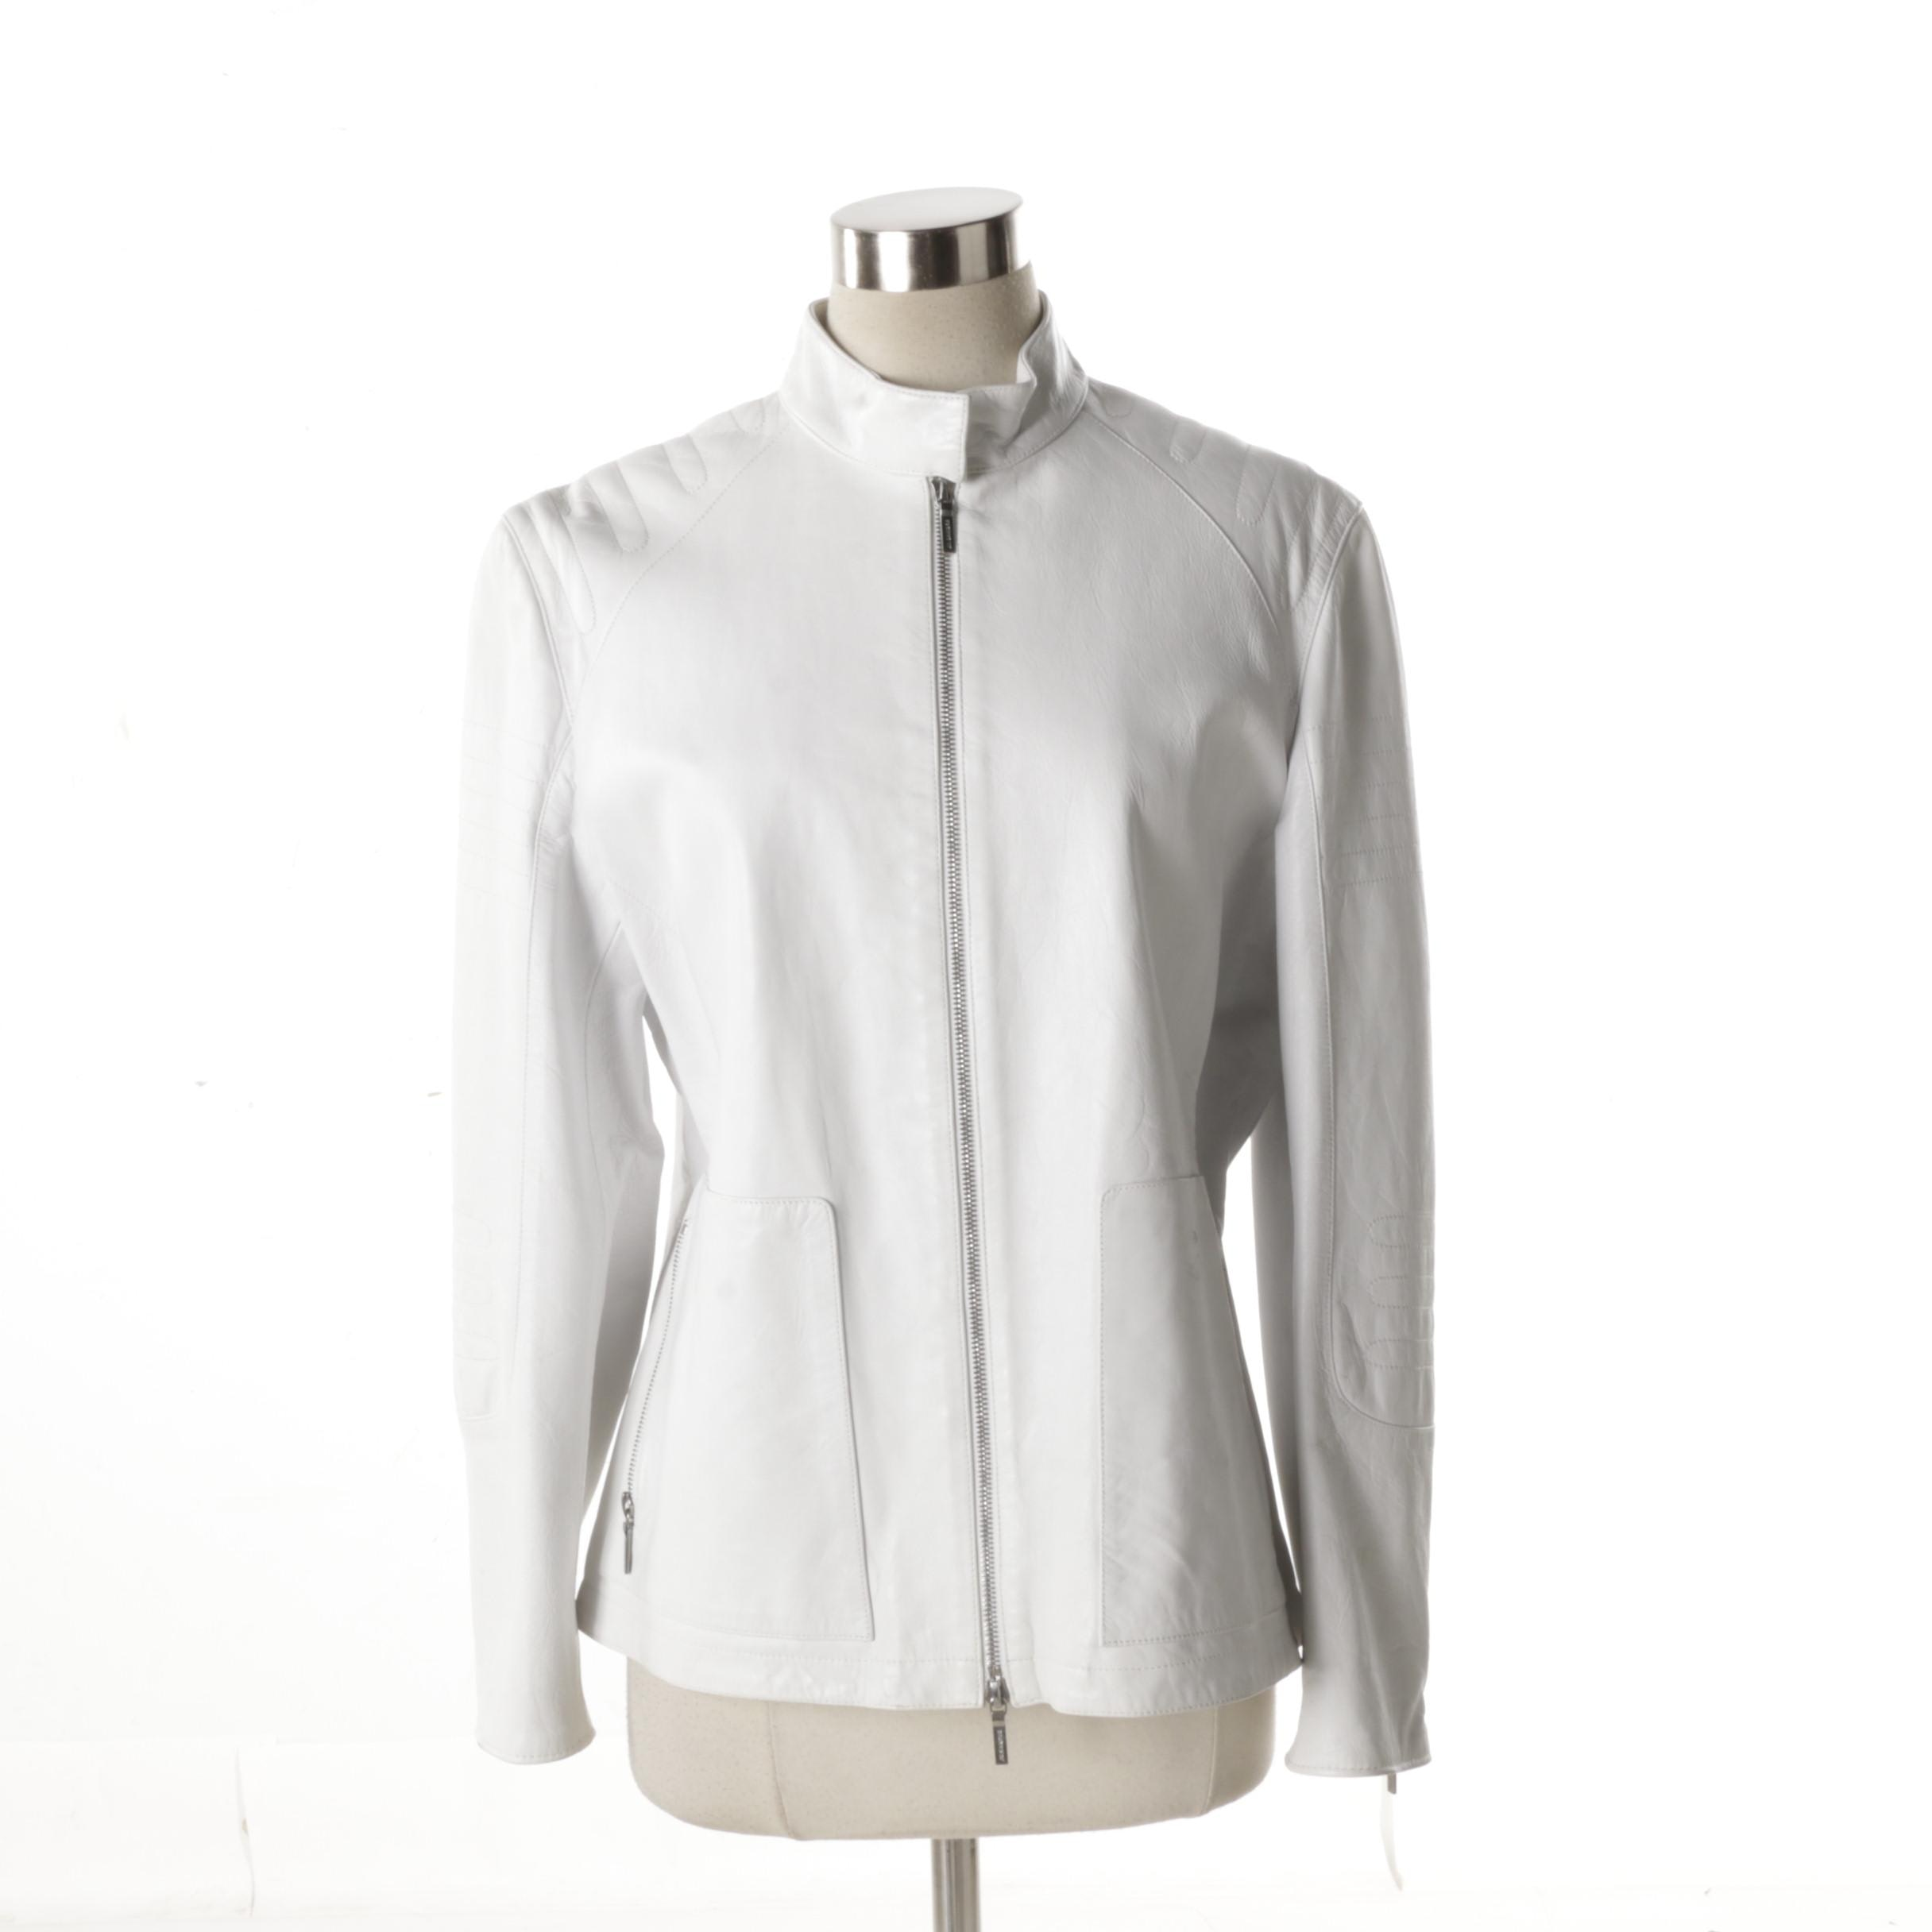 Women's Jil Sander White Leather Jacket